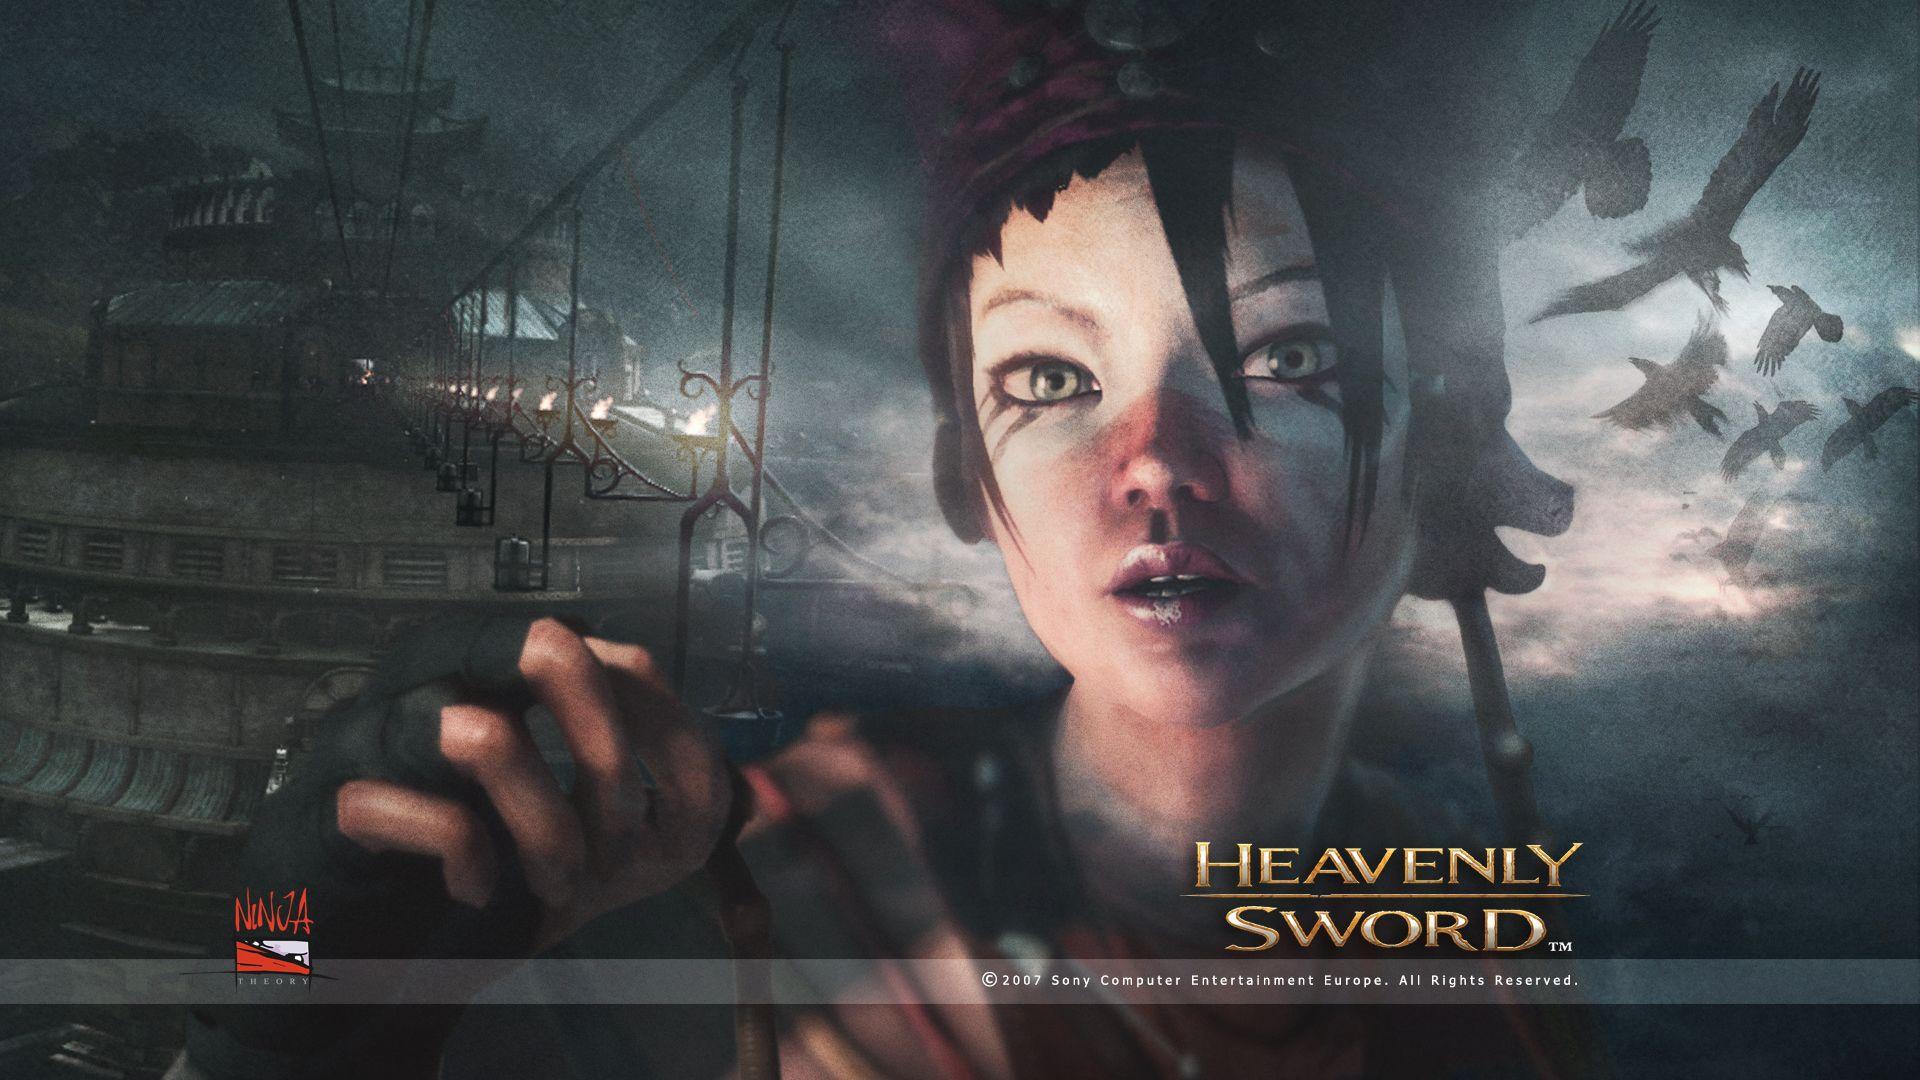 Heavenly Sword Google Search